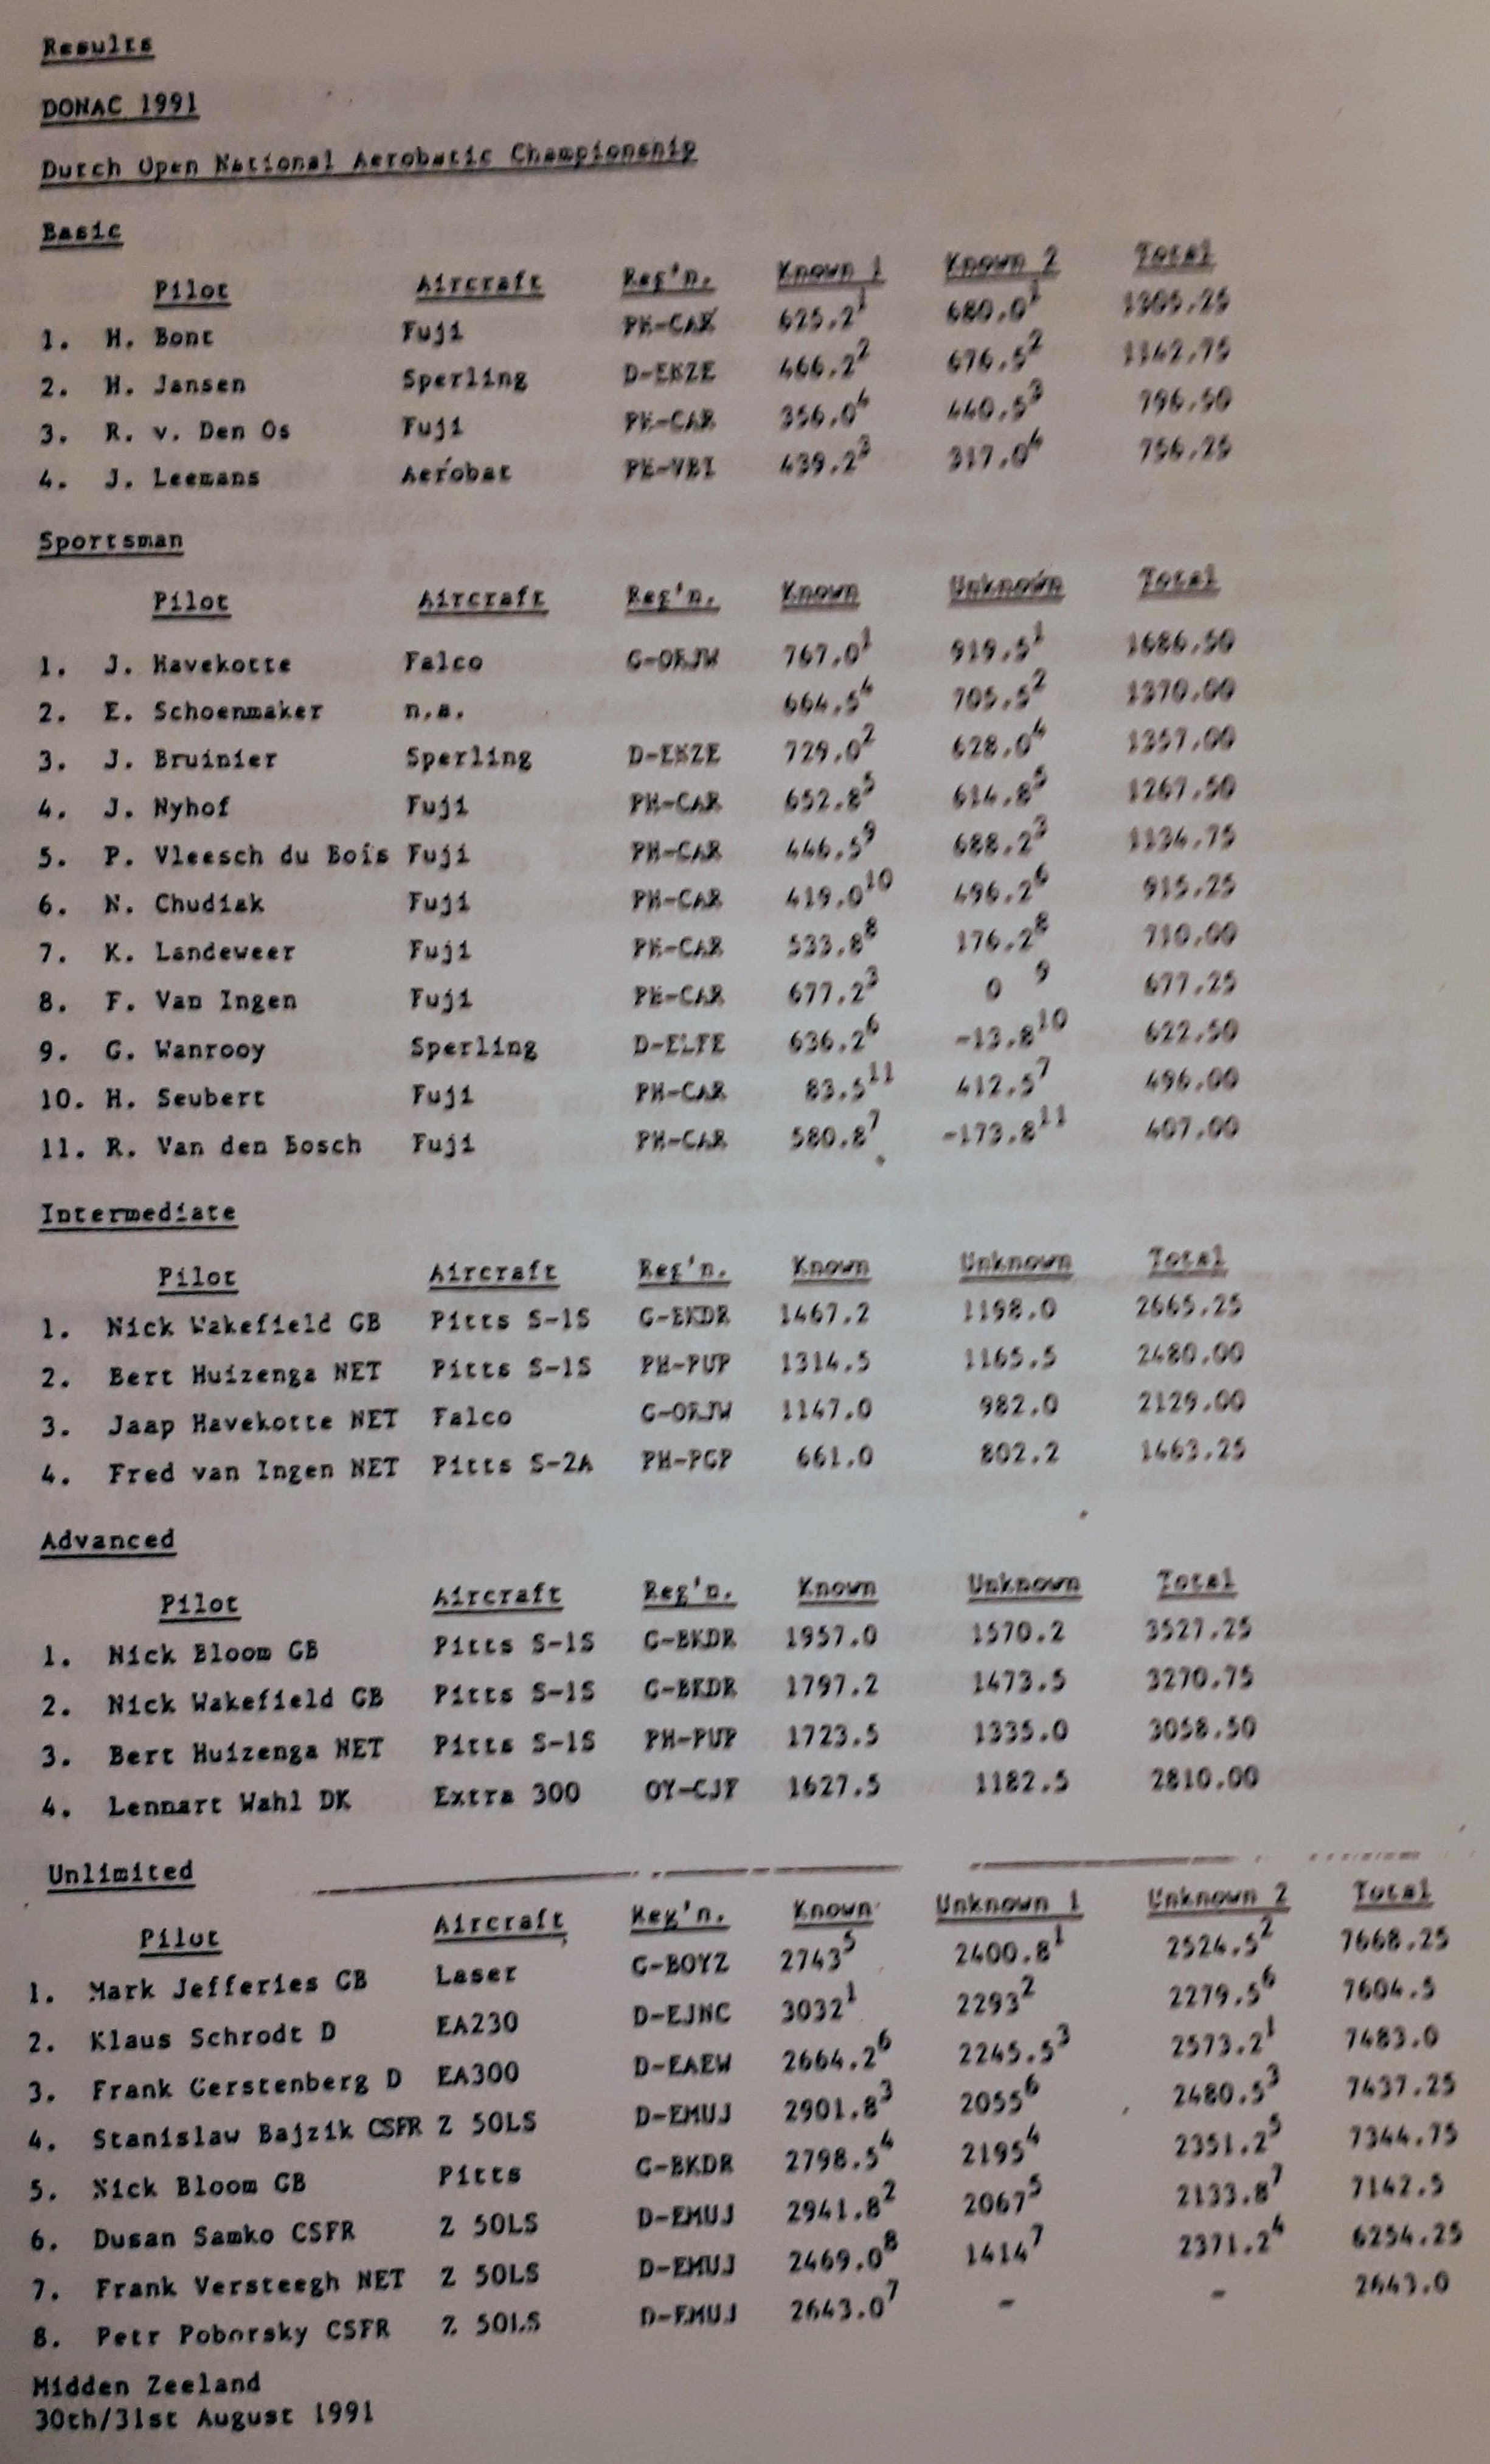 DONAC 1991 results